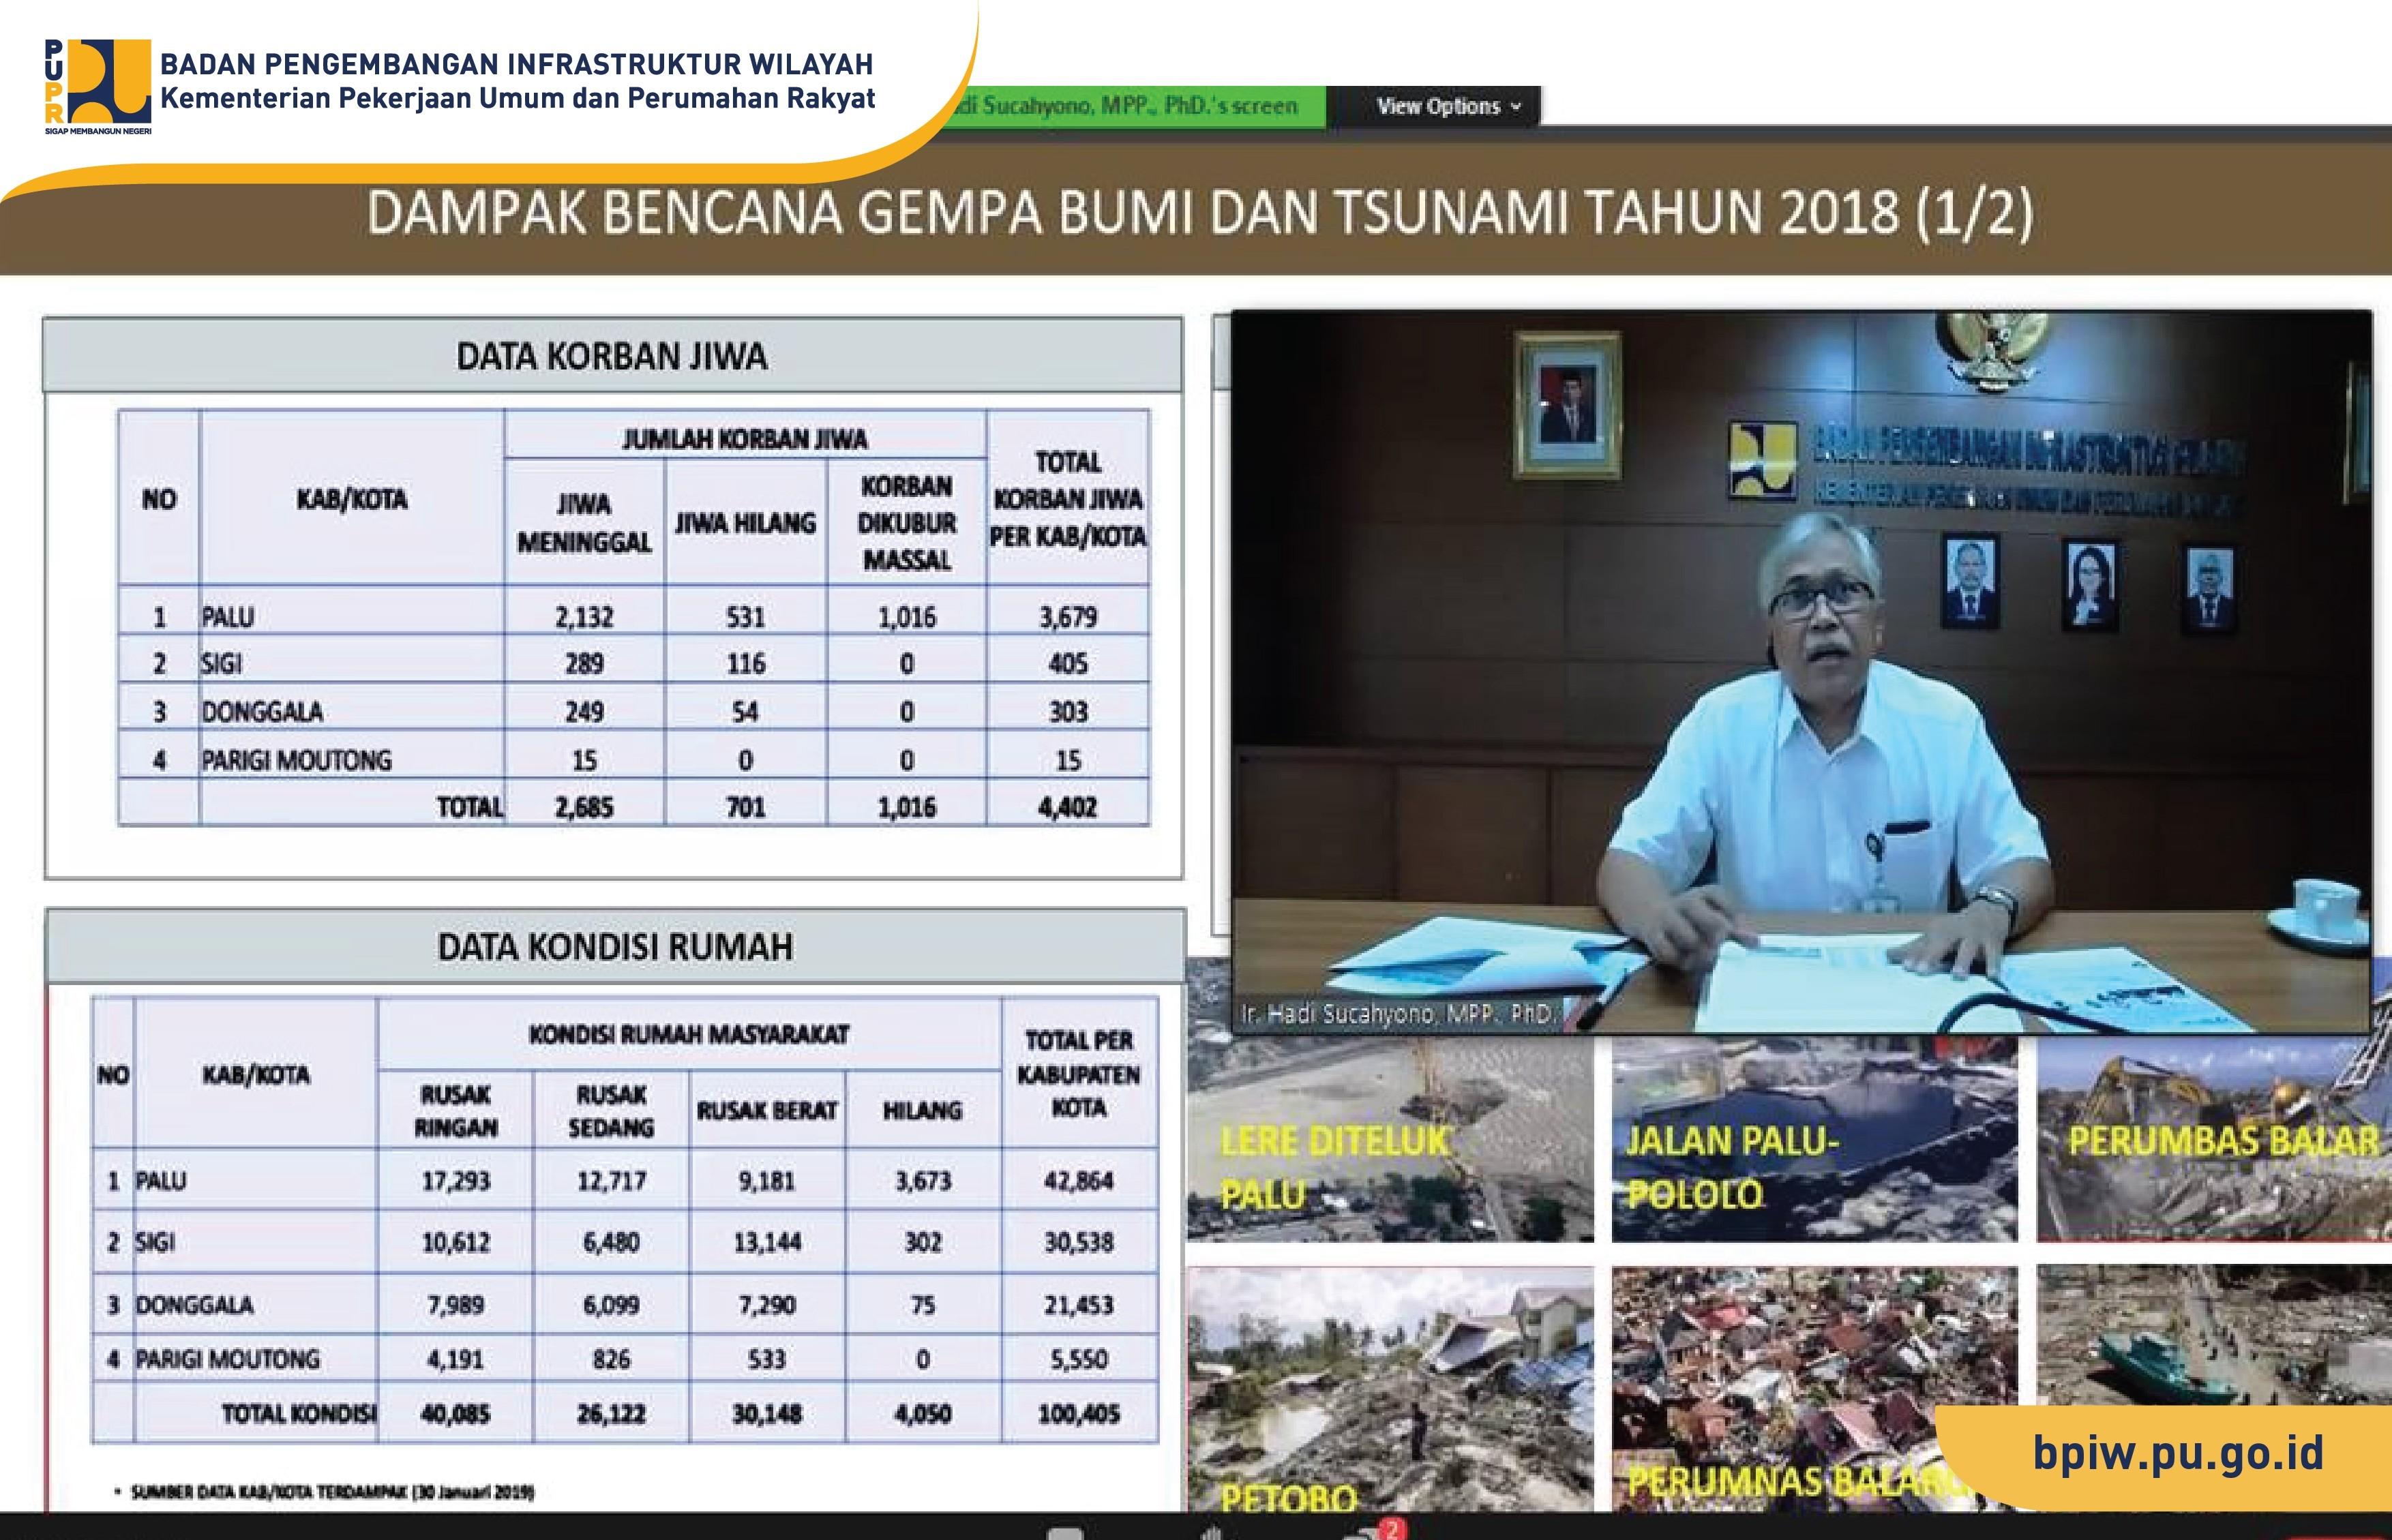 Analisis Geologi Dukung Akurasi Perencanaan Pembangunan Infrastruktur PUPR di Pasigala